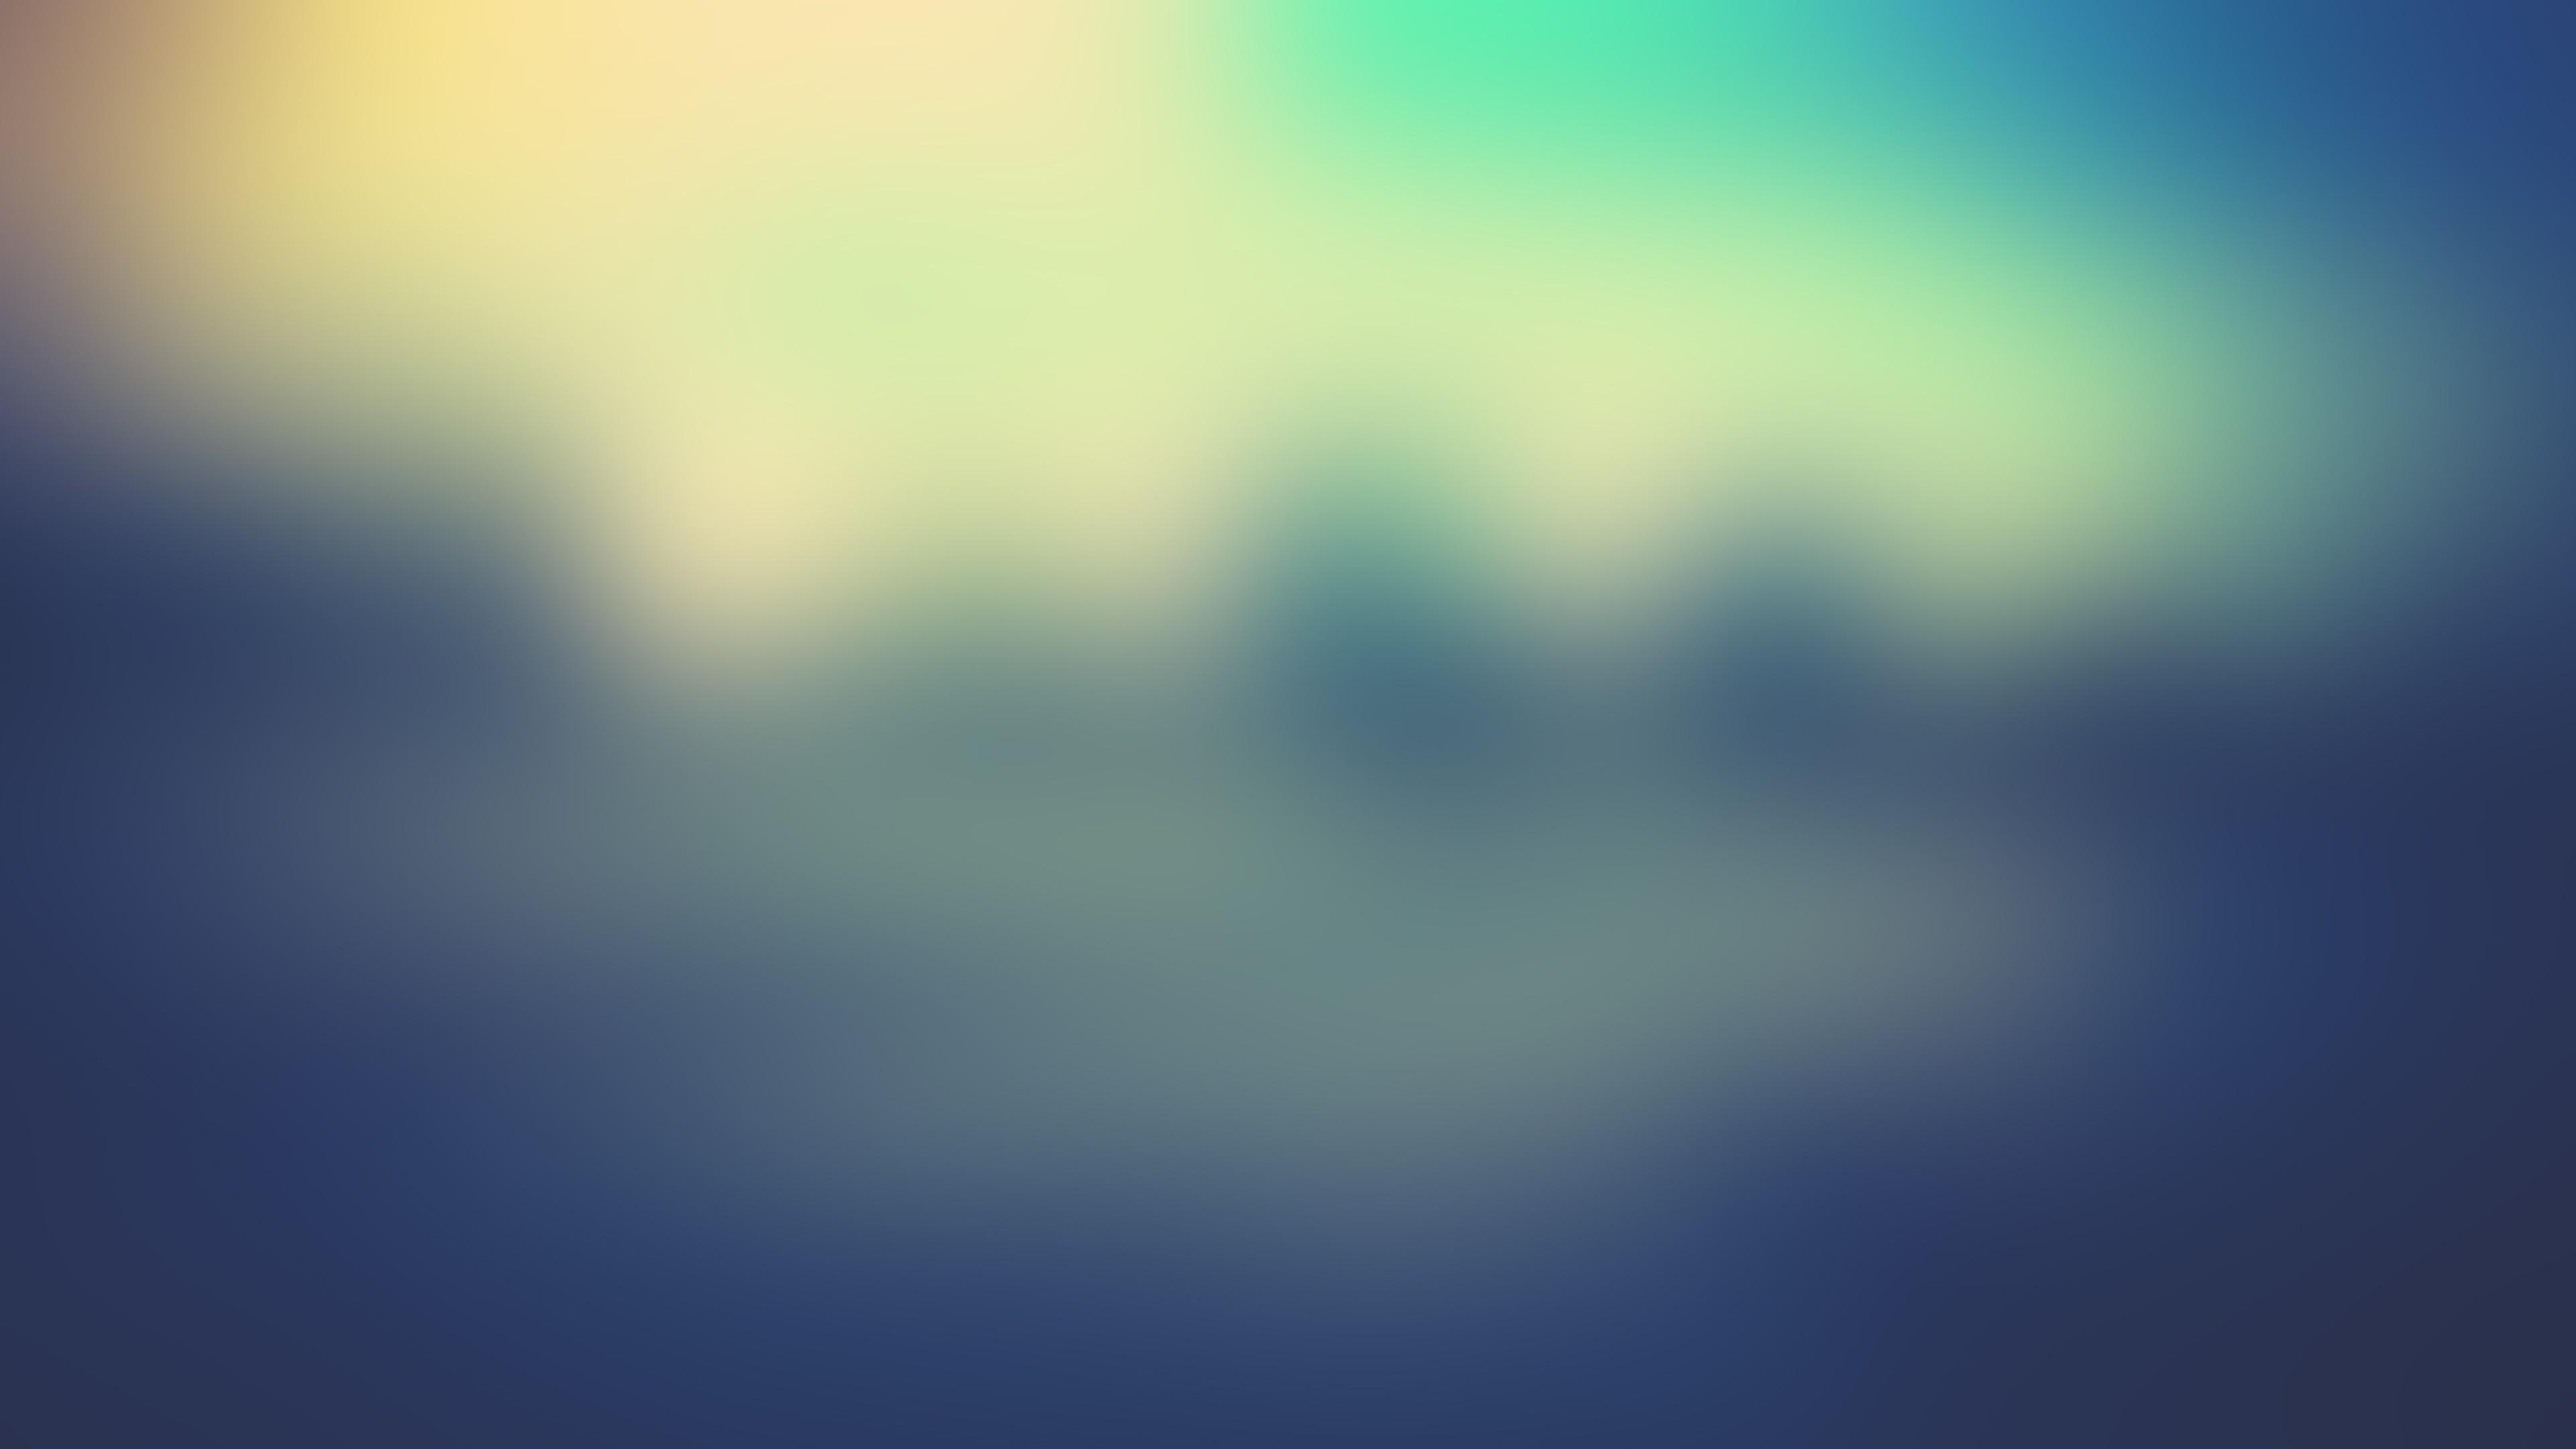 Background image 4k - Blured Background